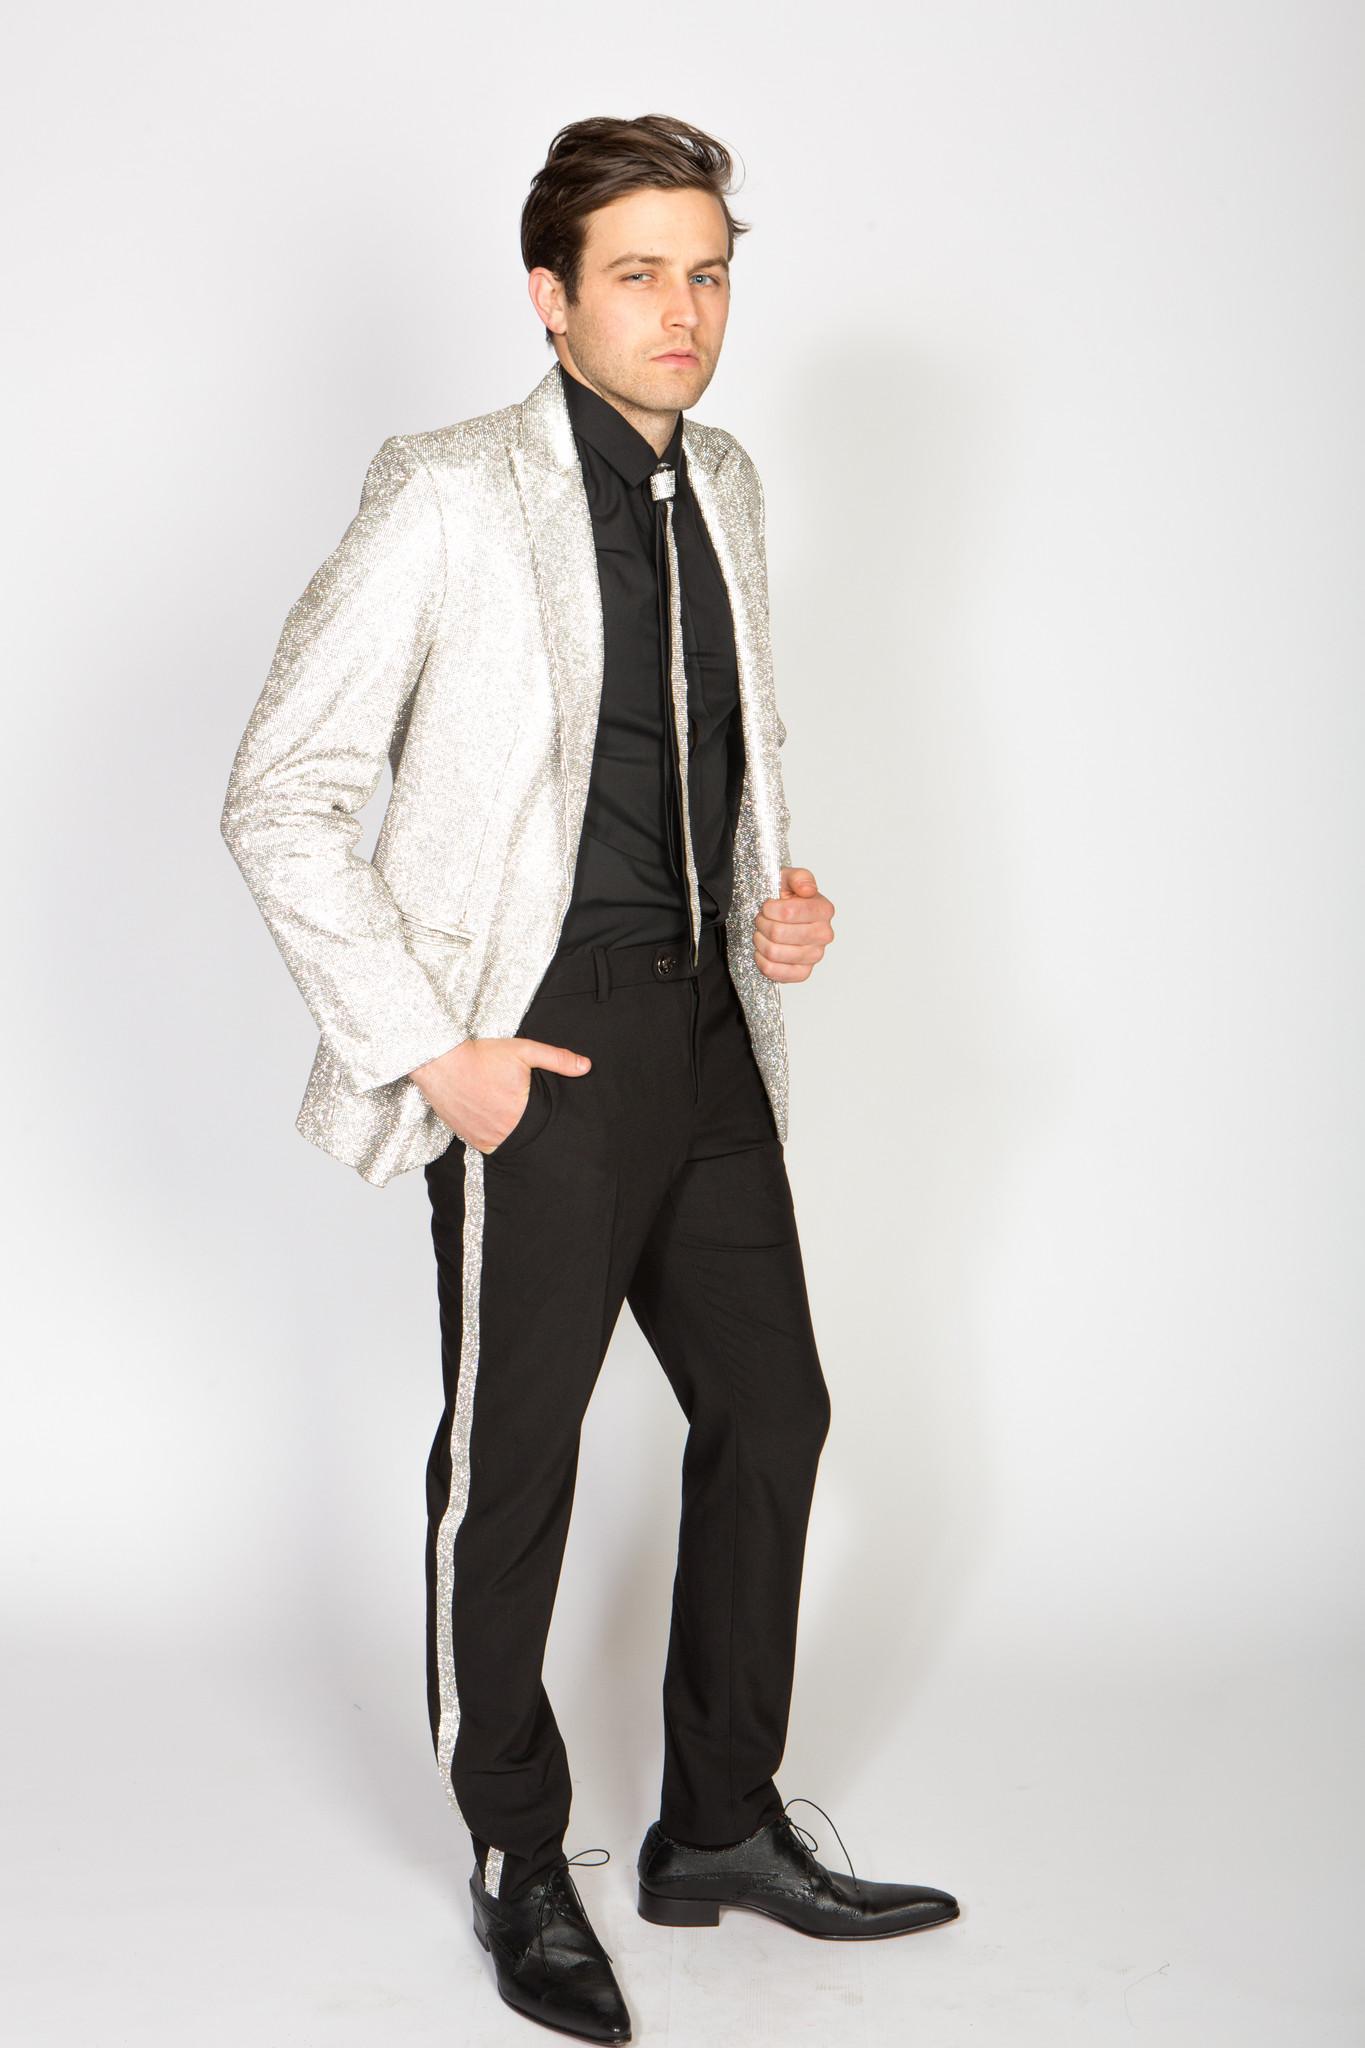 Any Old Iron Rhinestone Cowboy Suit  RHINESTONE SILVER